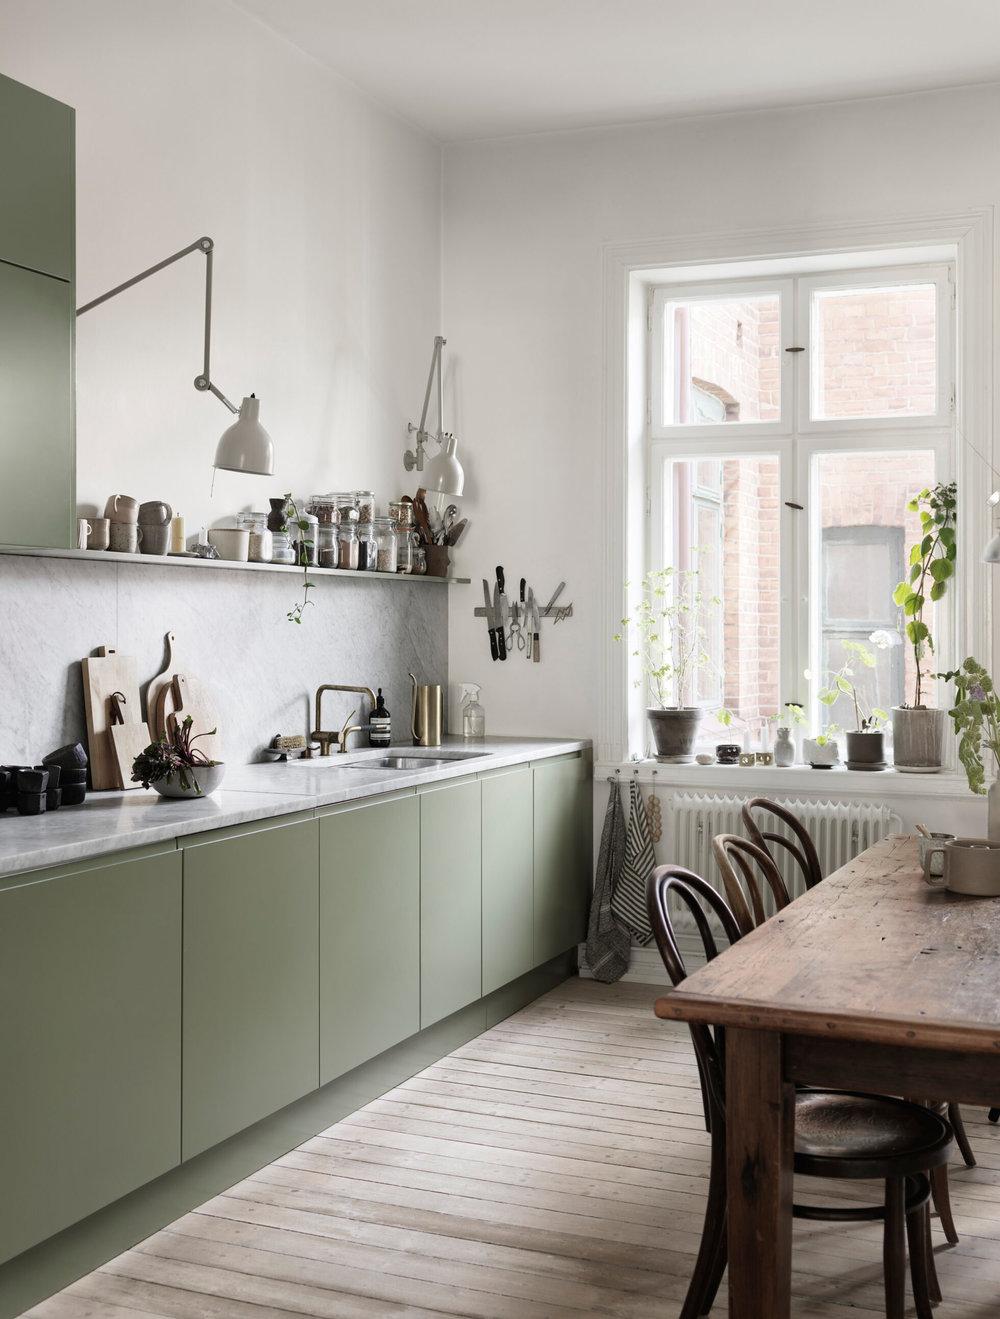 9 Inspiring Green Kitchen Designs That Bring Nature In   Nordic ...